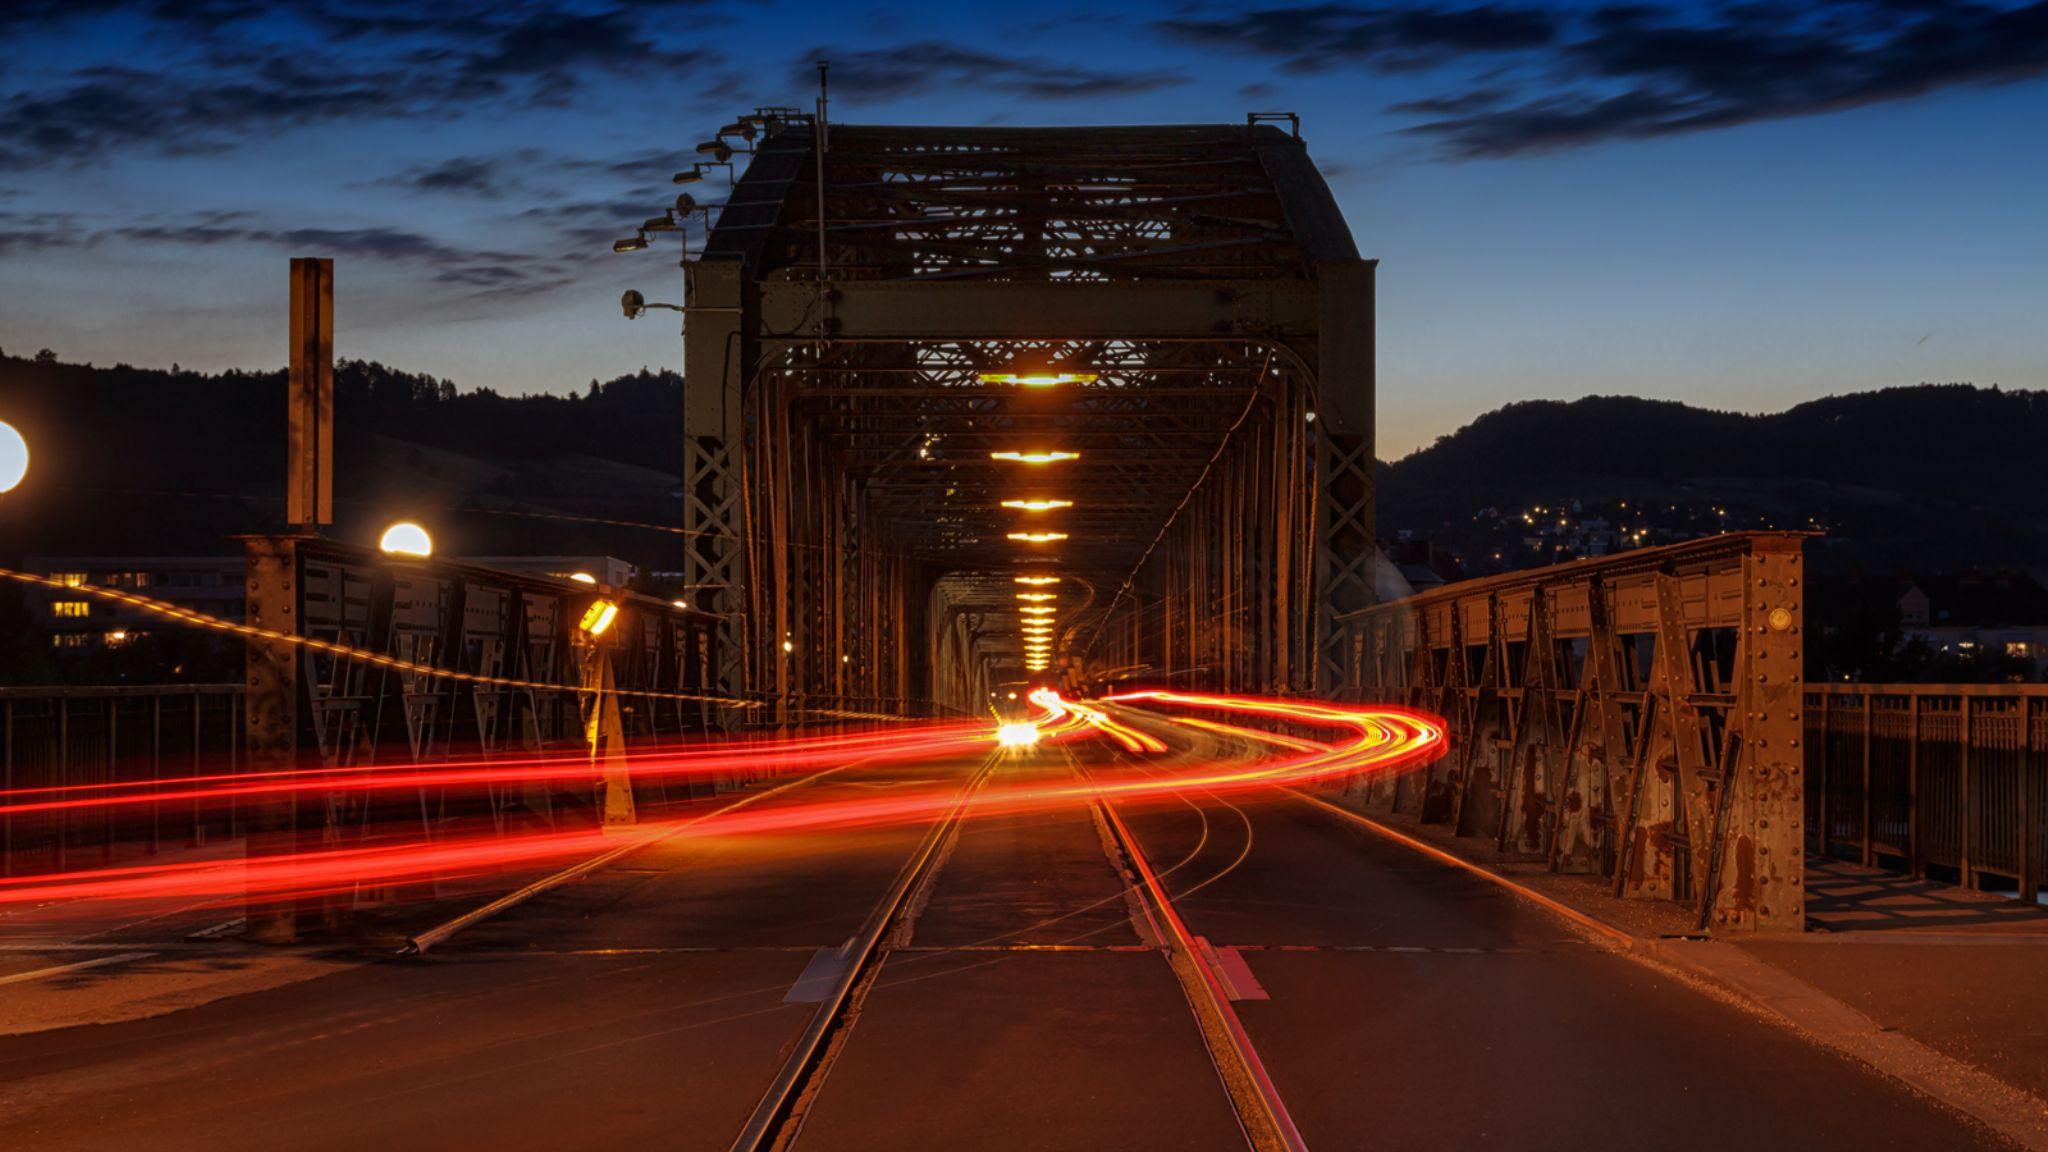 Alte Eisenbahnbrücke Linz by Bastian Schimpf